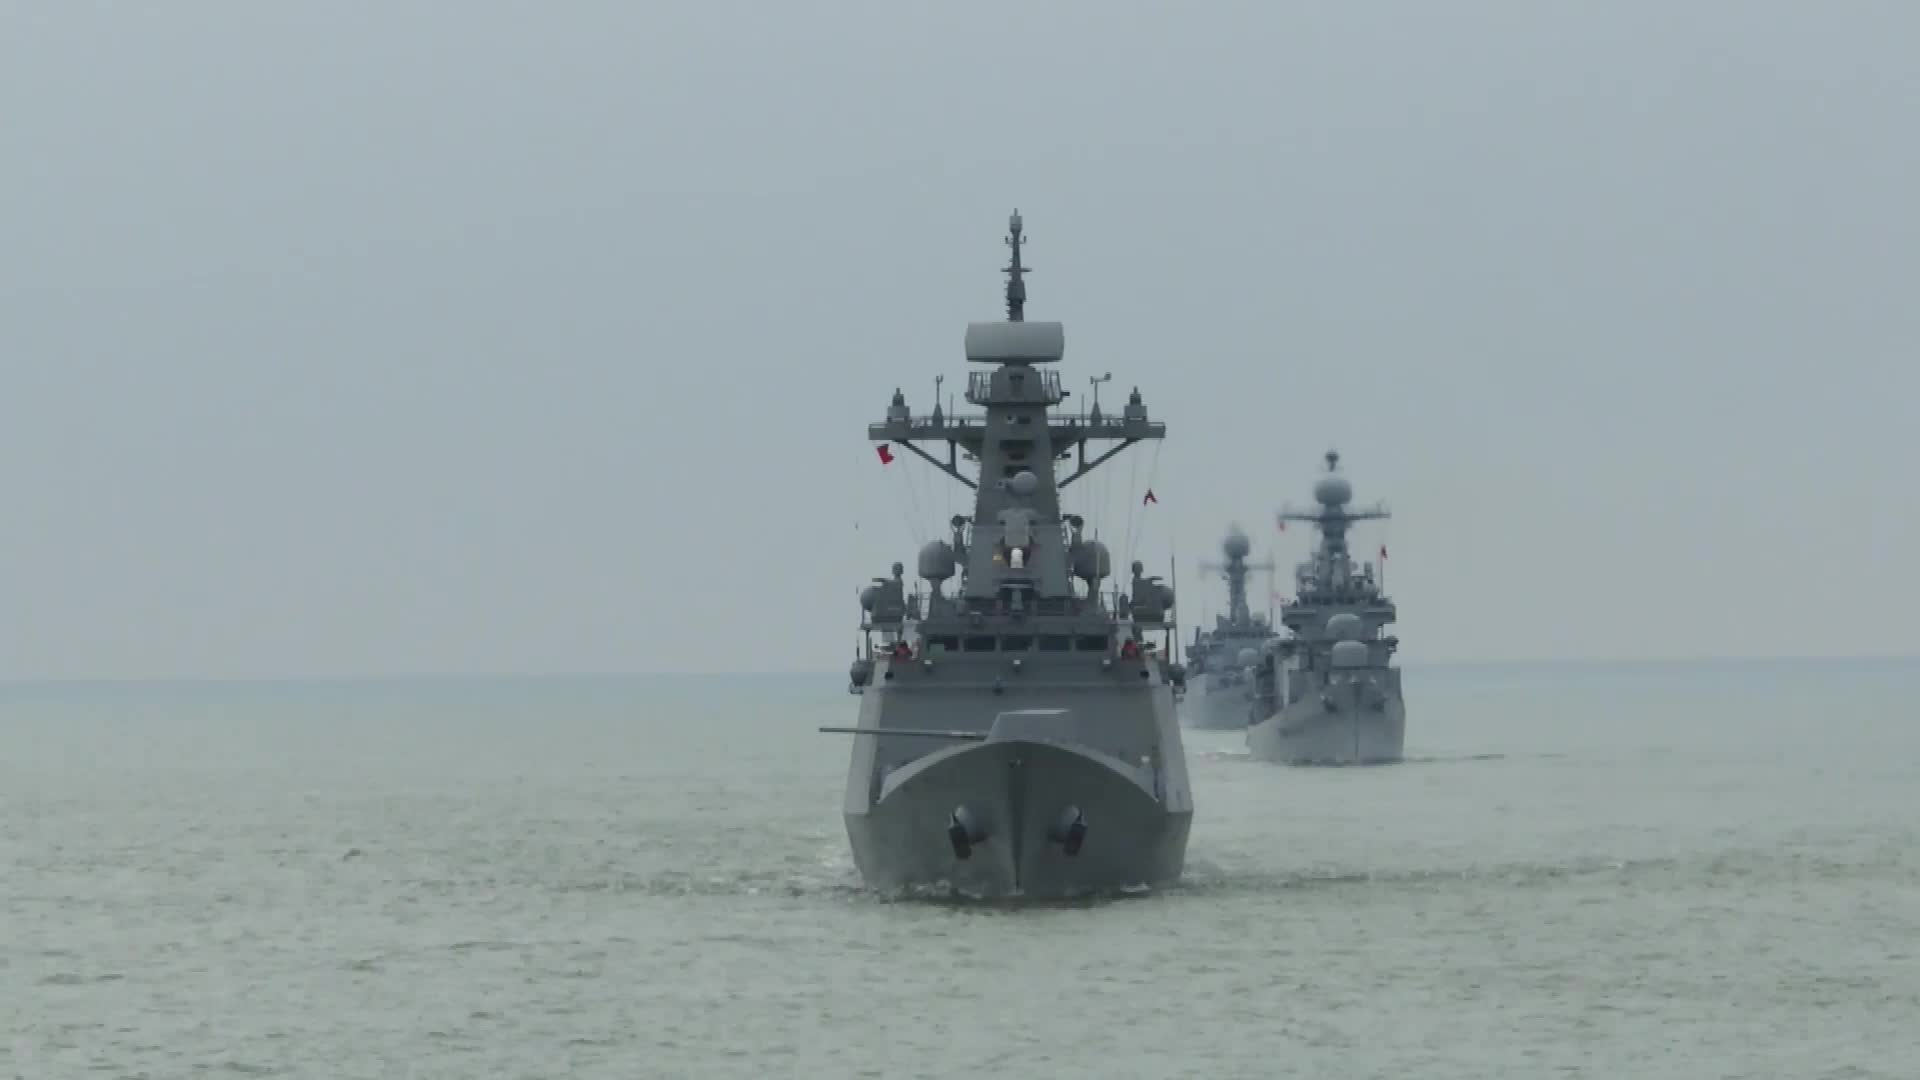 korea, military, militarygfys, south korea, Naval Gunfire GIFs